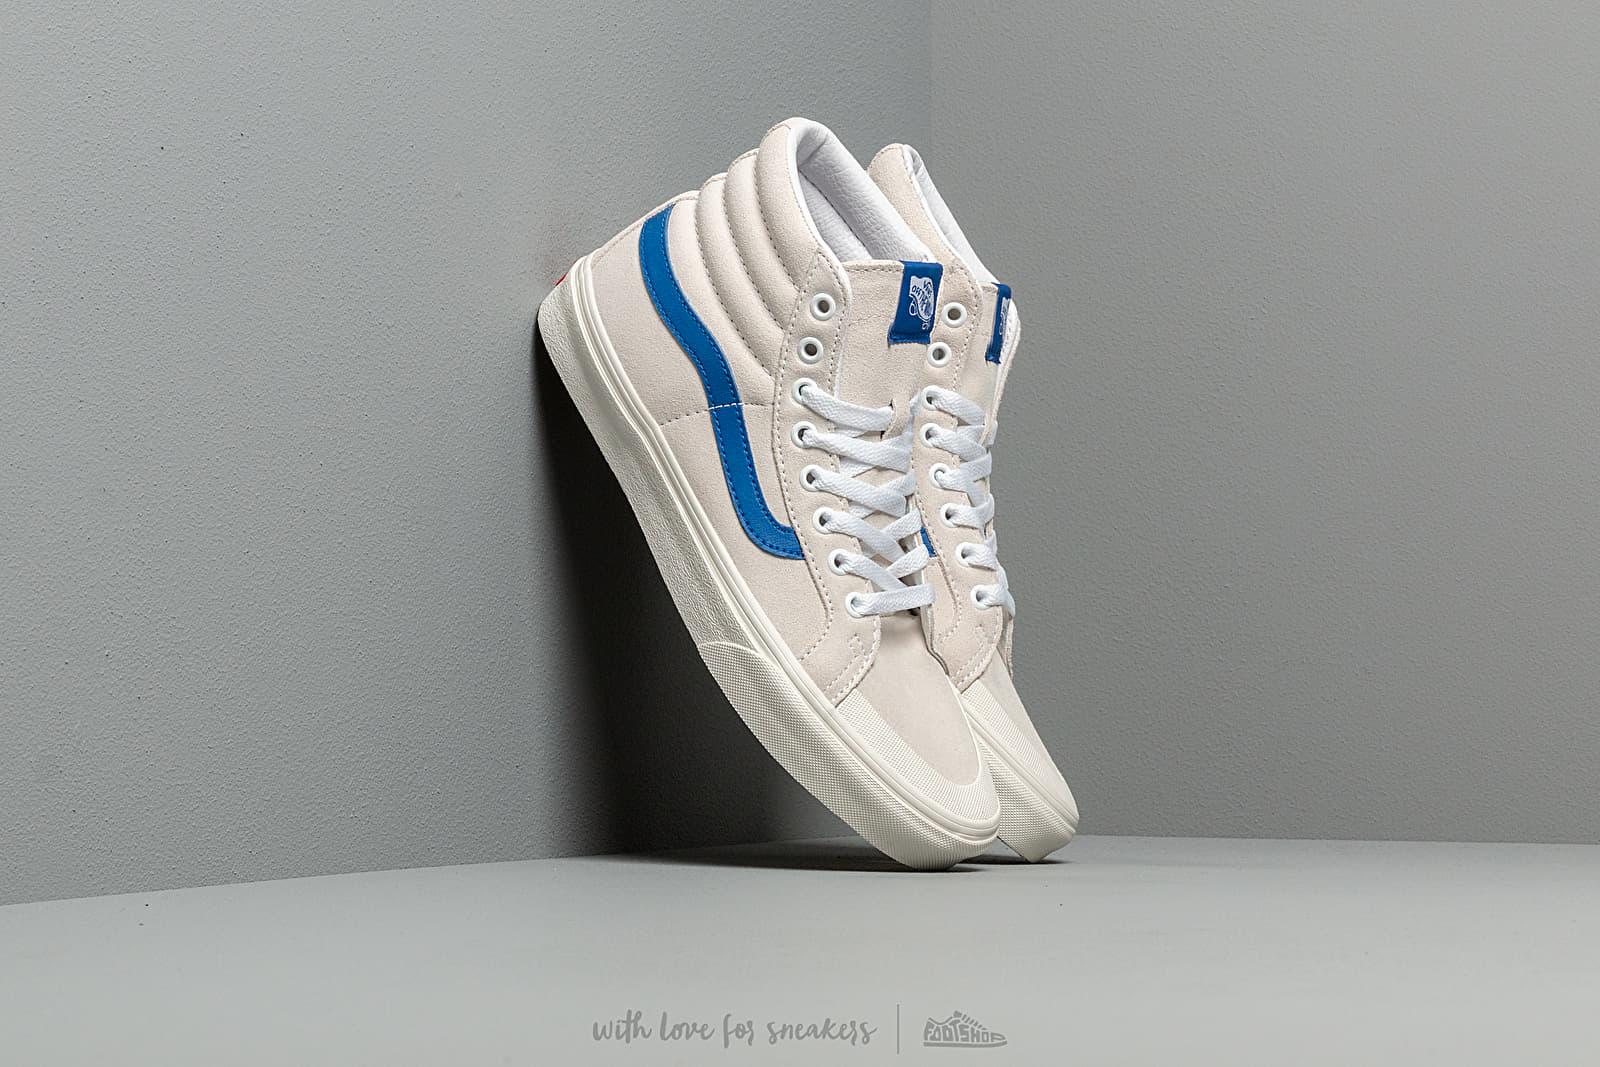 Vans SK8-Hi Reissue 138 True White/ Lapis Blue za skvelú cenu 73 € kúpite na Footshop.sk